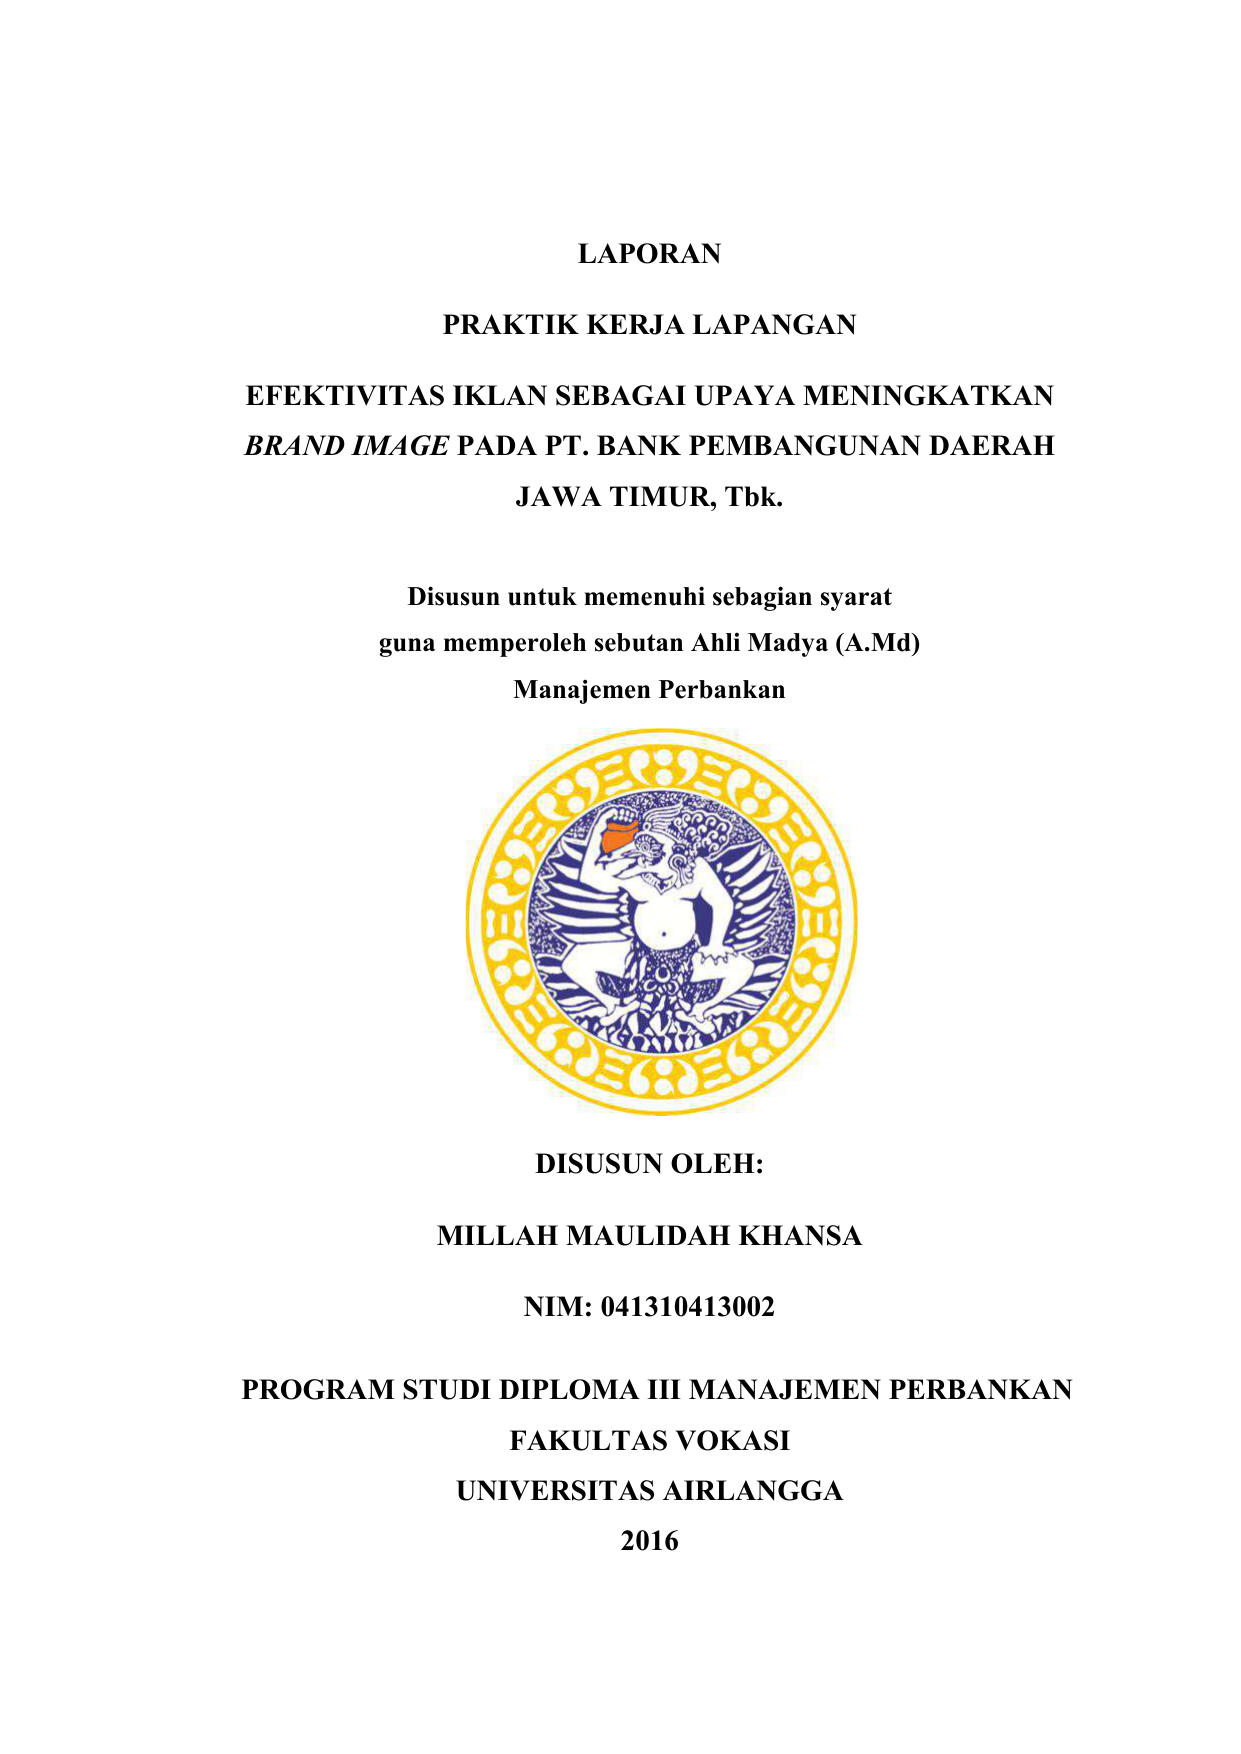 Contoh Judul Laporan Pkl Di Bank Jatim Kumpulan Contoh Laporan